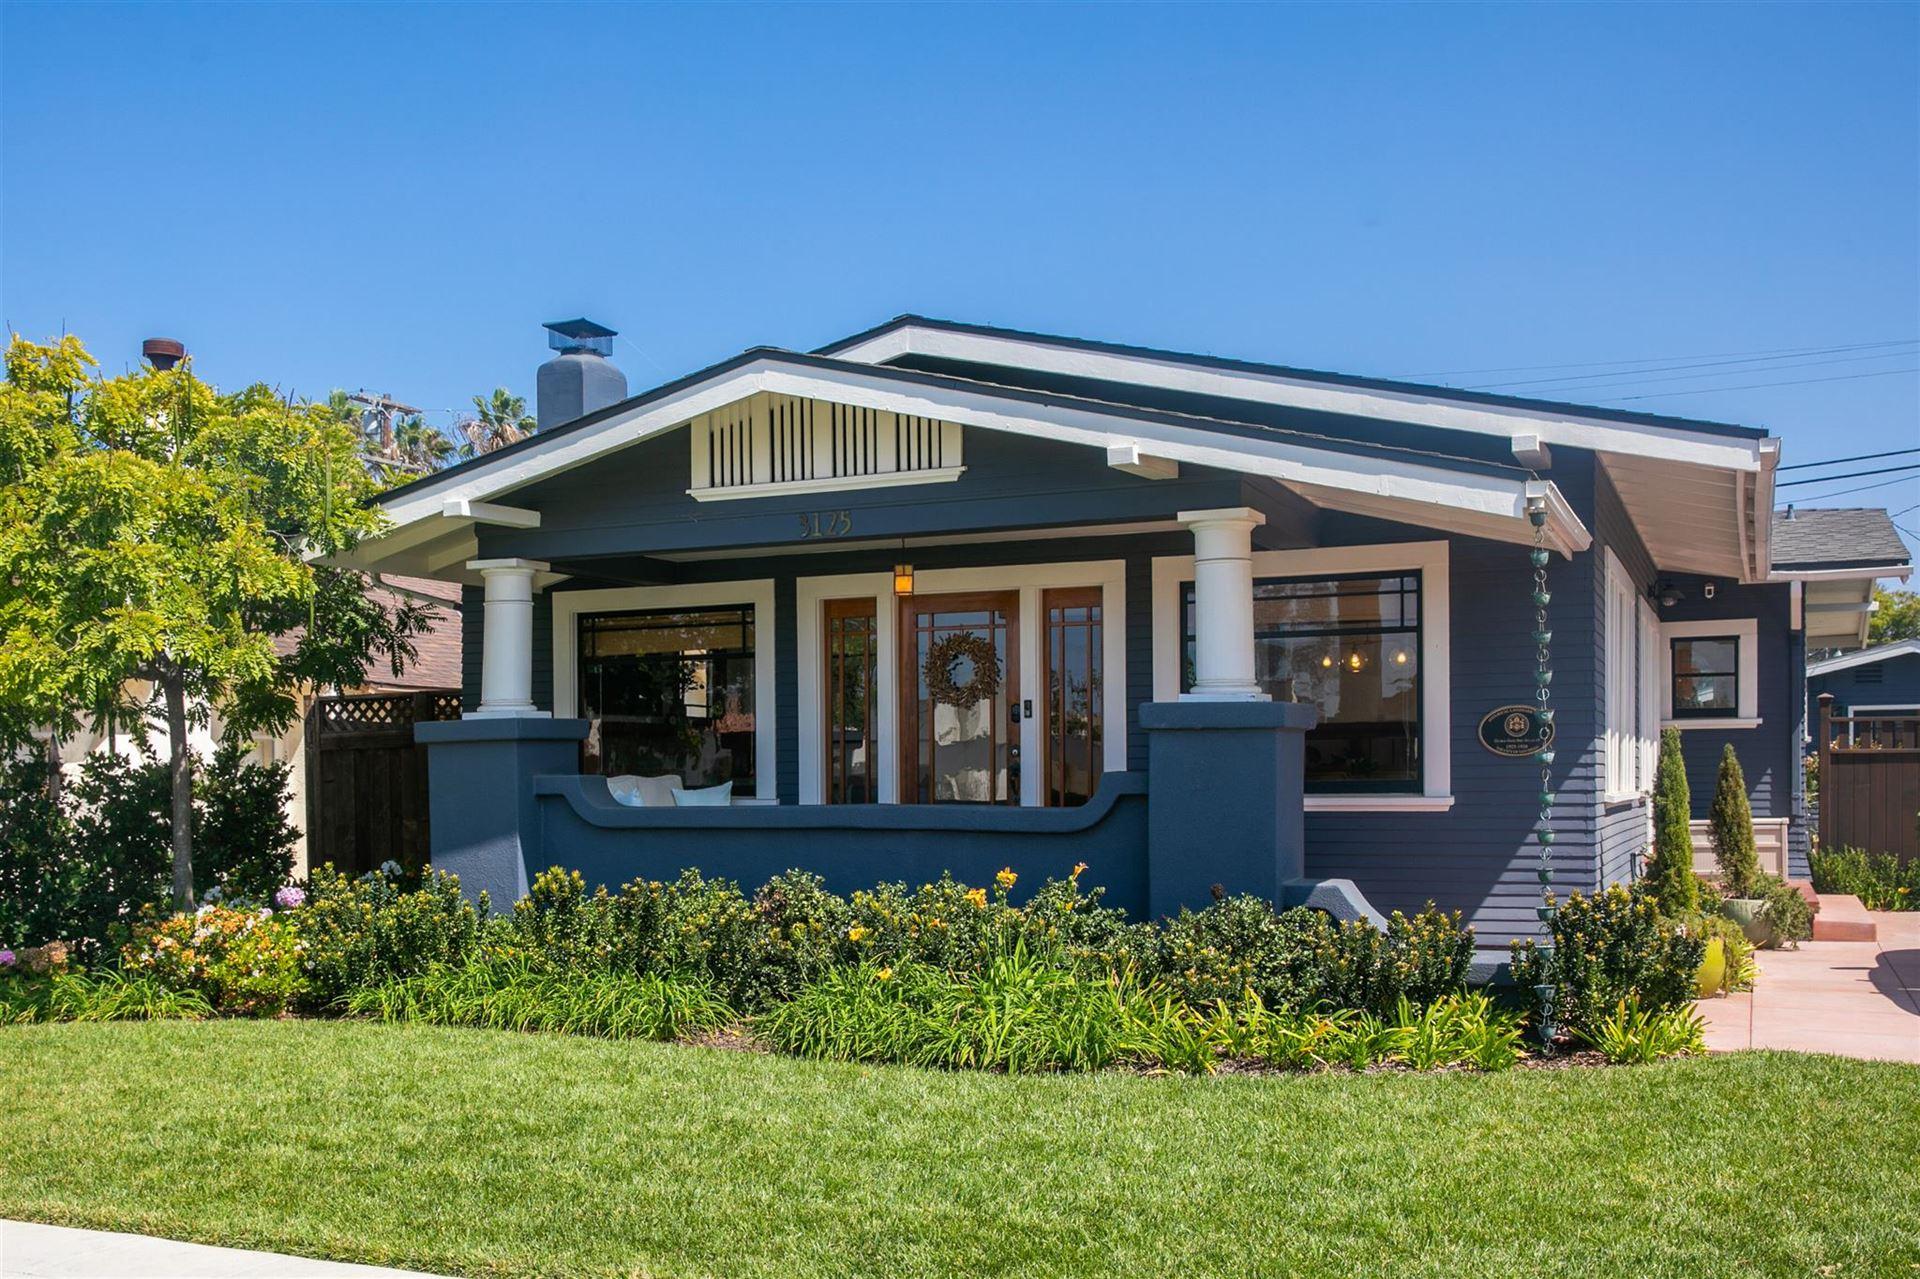 Photo of 3125 Bancroft St., San Diego, CA 92104 (MLS # 200046062)